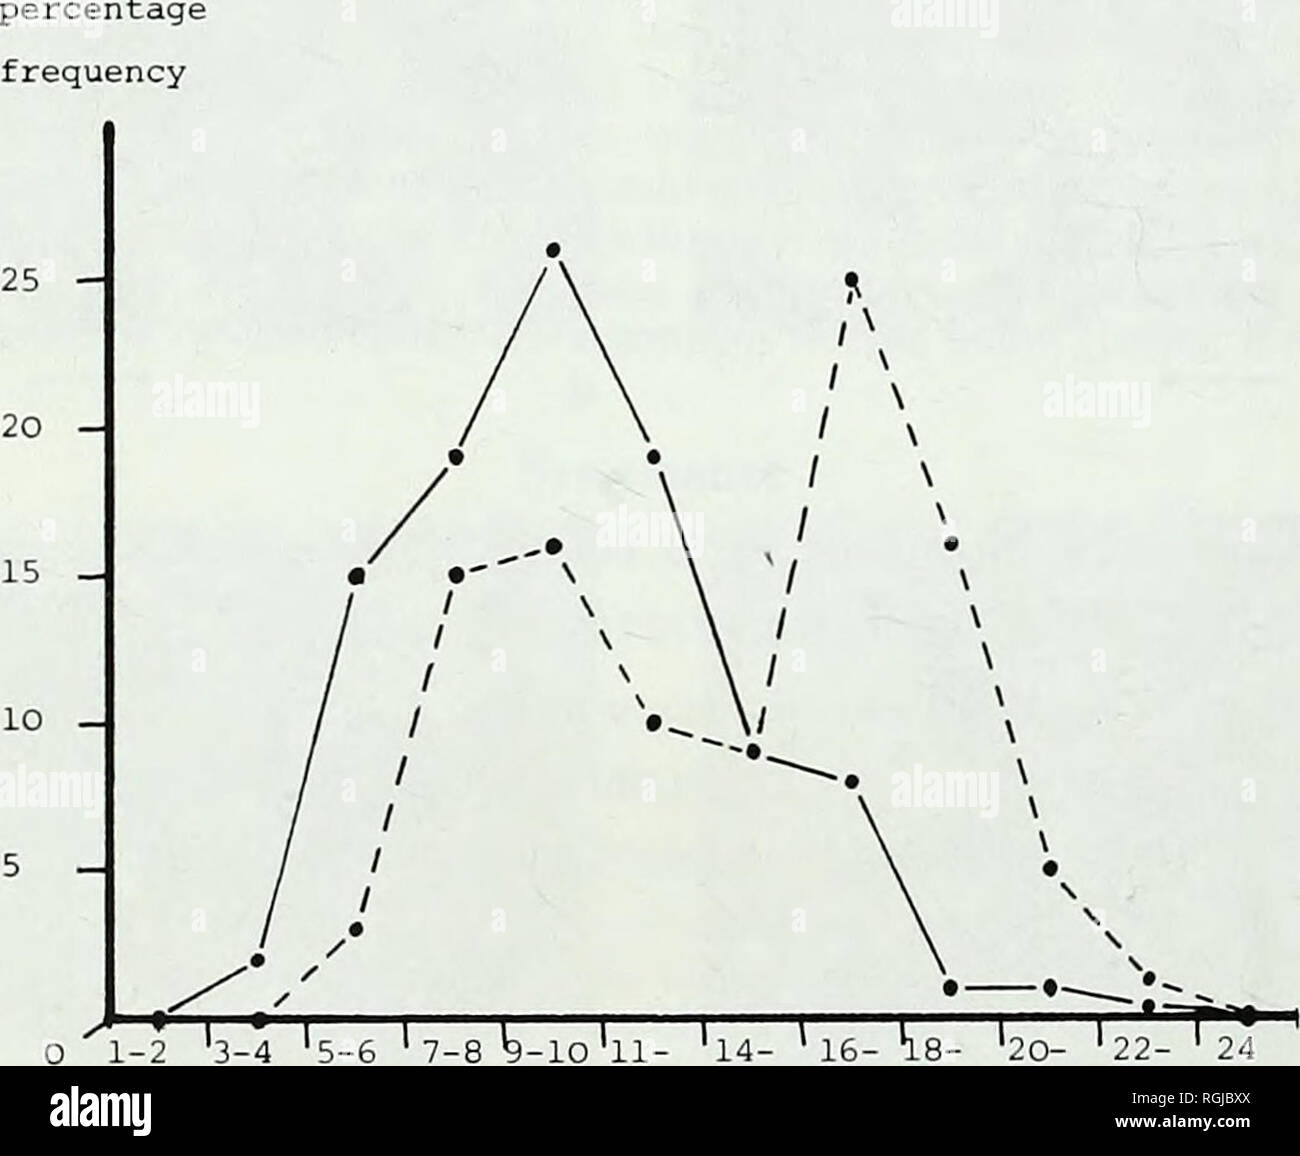 . Bulletin of the British Museum (Natural History). 96 H. M. C. DANIELLI [= Argirvanellum Rothpletz, 1916; Batinevia Korde, 1966; Bolomlnella Reitlinger, 1959; Fisliilella Korde, 1973; Kenella Korde, 1973; Nicholsonia Korde, 1973; Siphonema Bornemann, 1886; Slrephochenis Seey, lUS; Slromatocerium MiUer, 1882], Range. Upper Proterozoic to Middle Cretaceous. Diagnosis. Microscopic tubular encrustations and/or impregnations of sheaths of fila- mentous organisms; filaments arranged at random or prostrate, rarely vertically; filaments single or in growths of variable size, shape and density; orien - Stock Image